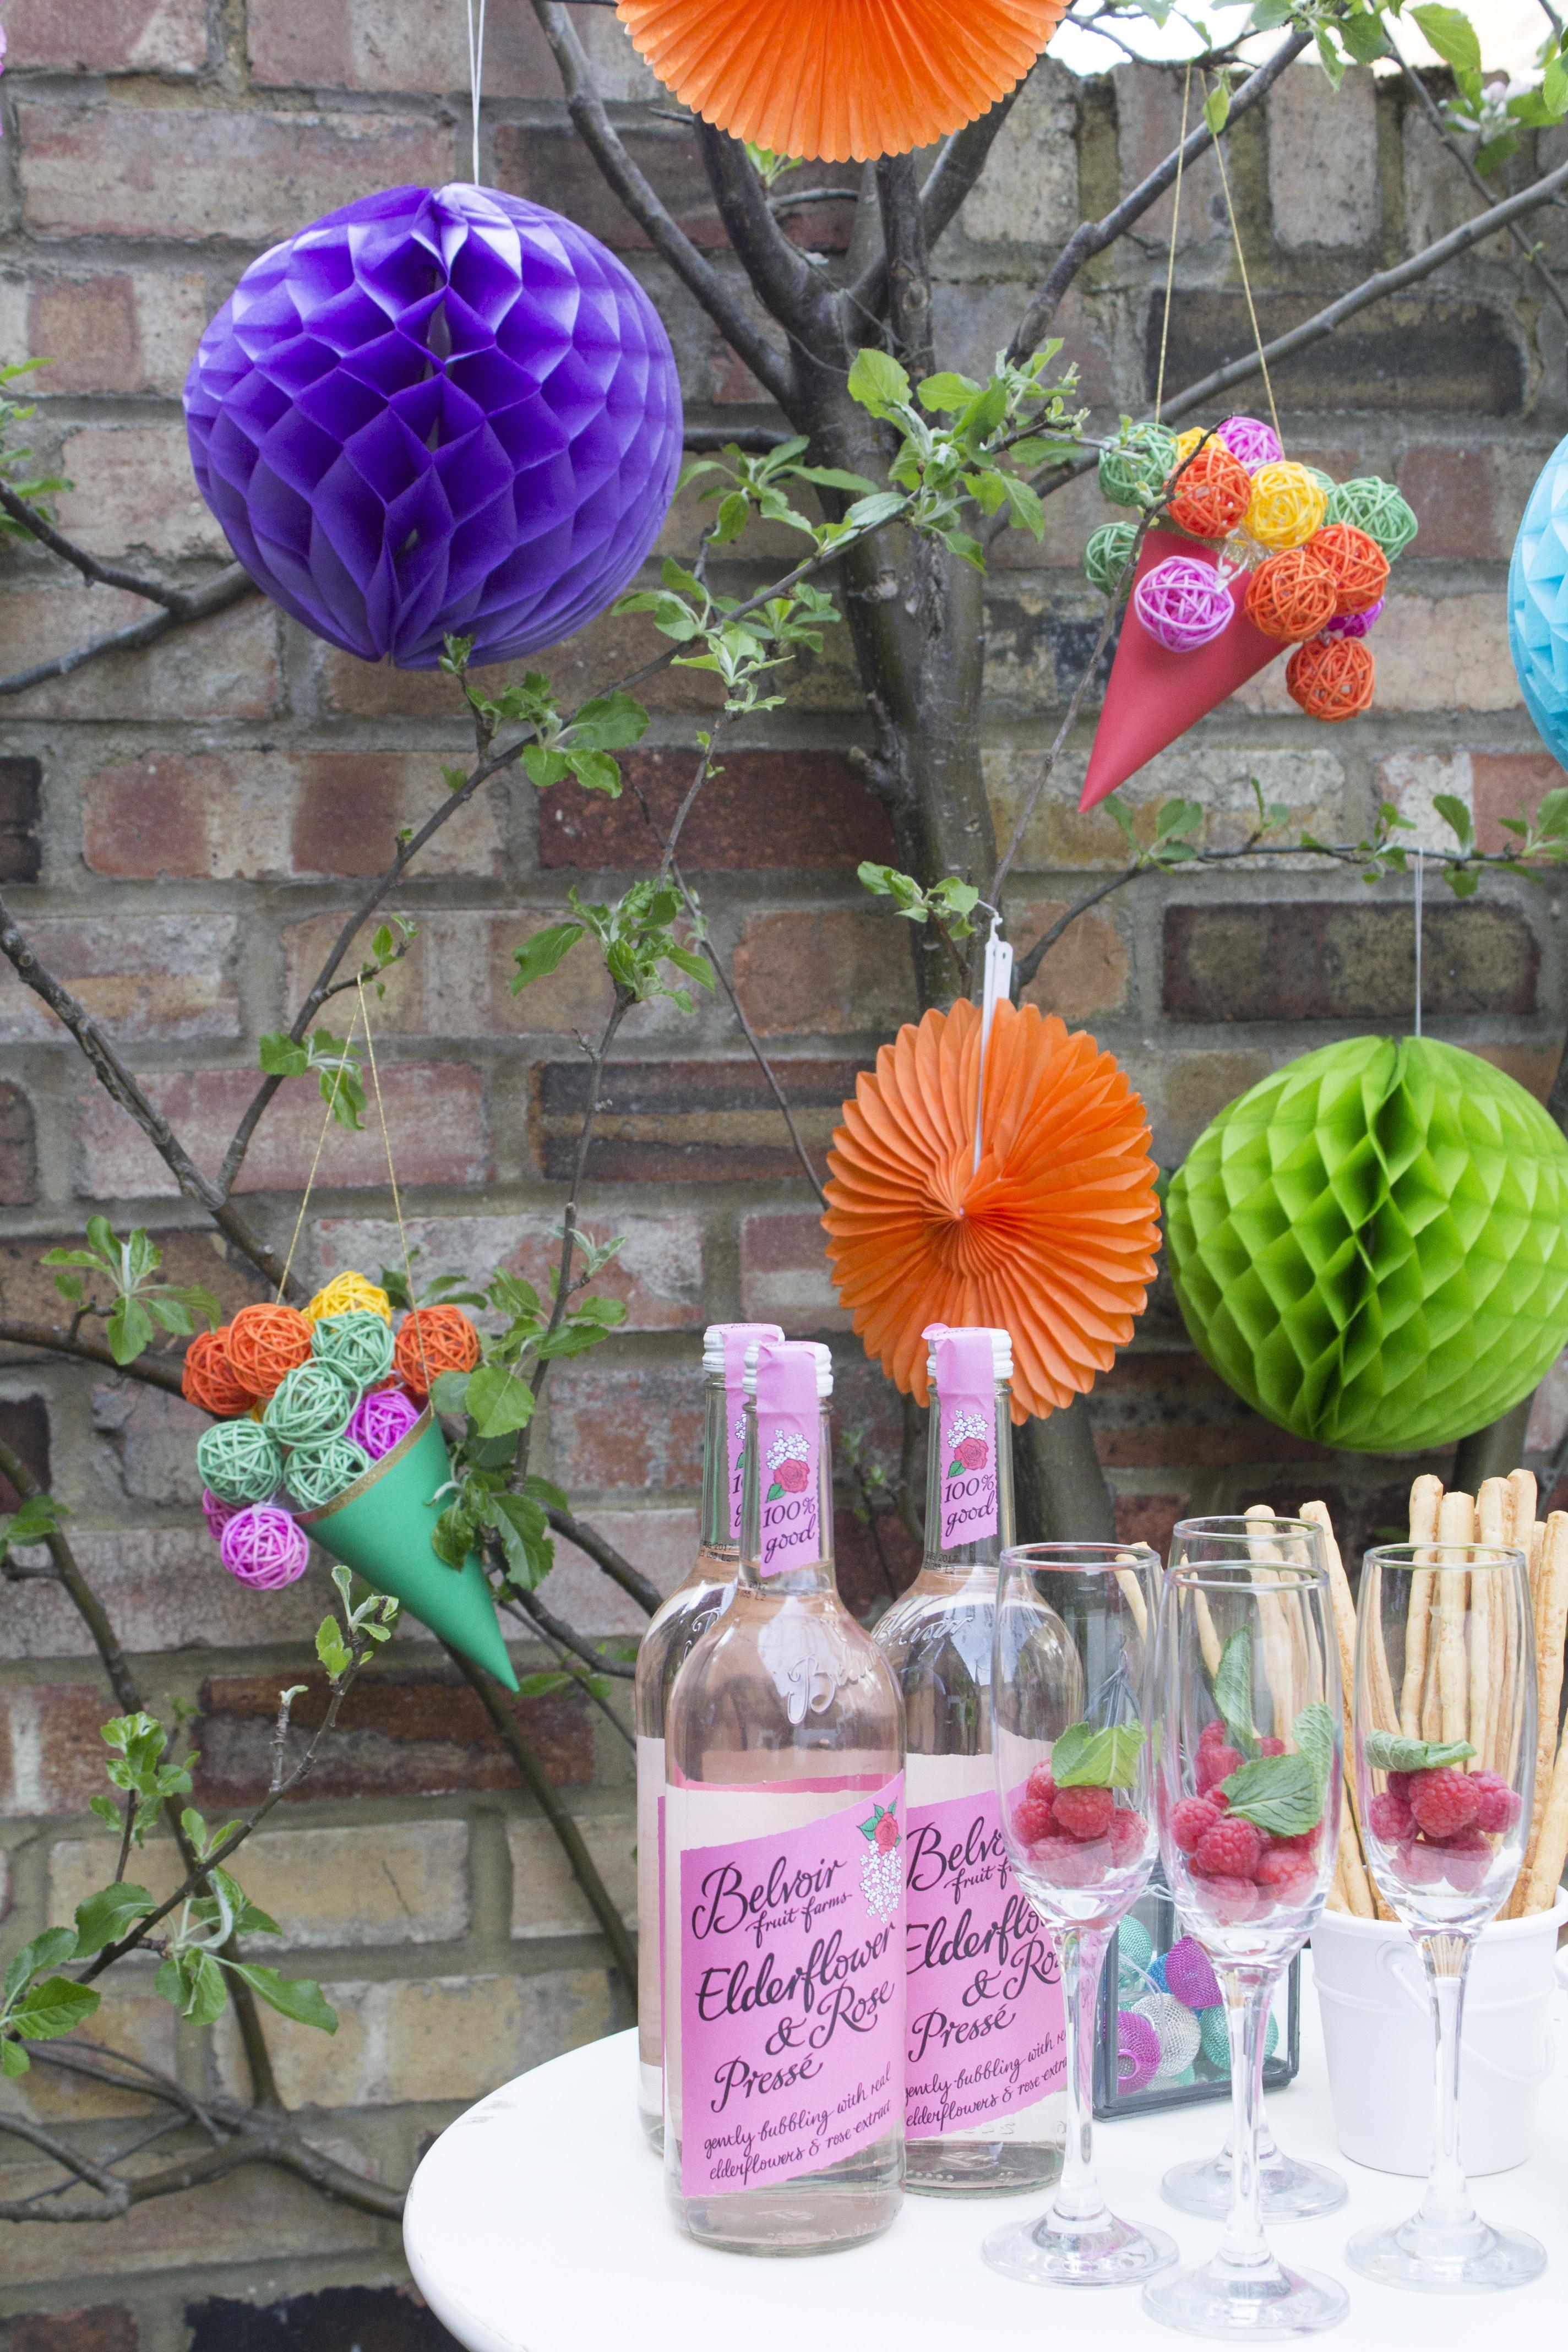 Macmillan-Summer-Lights-tea-party-photo-by-Geraldine-Tan-Little-Big-Bell